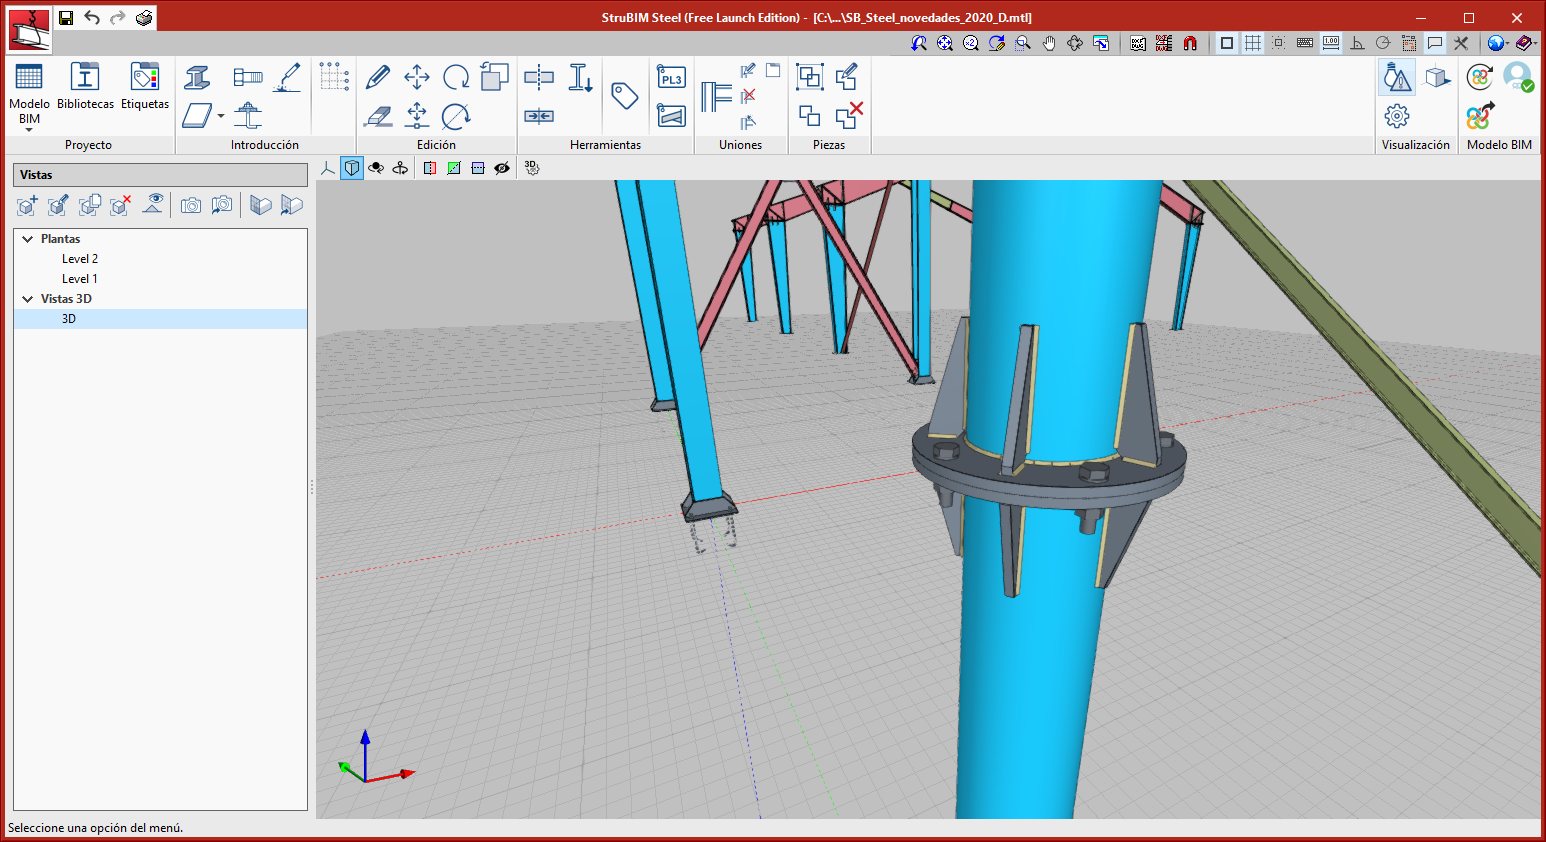 StruBIM Steel. Empalme de tubos circulares